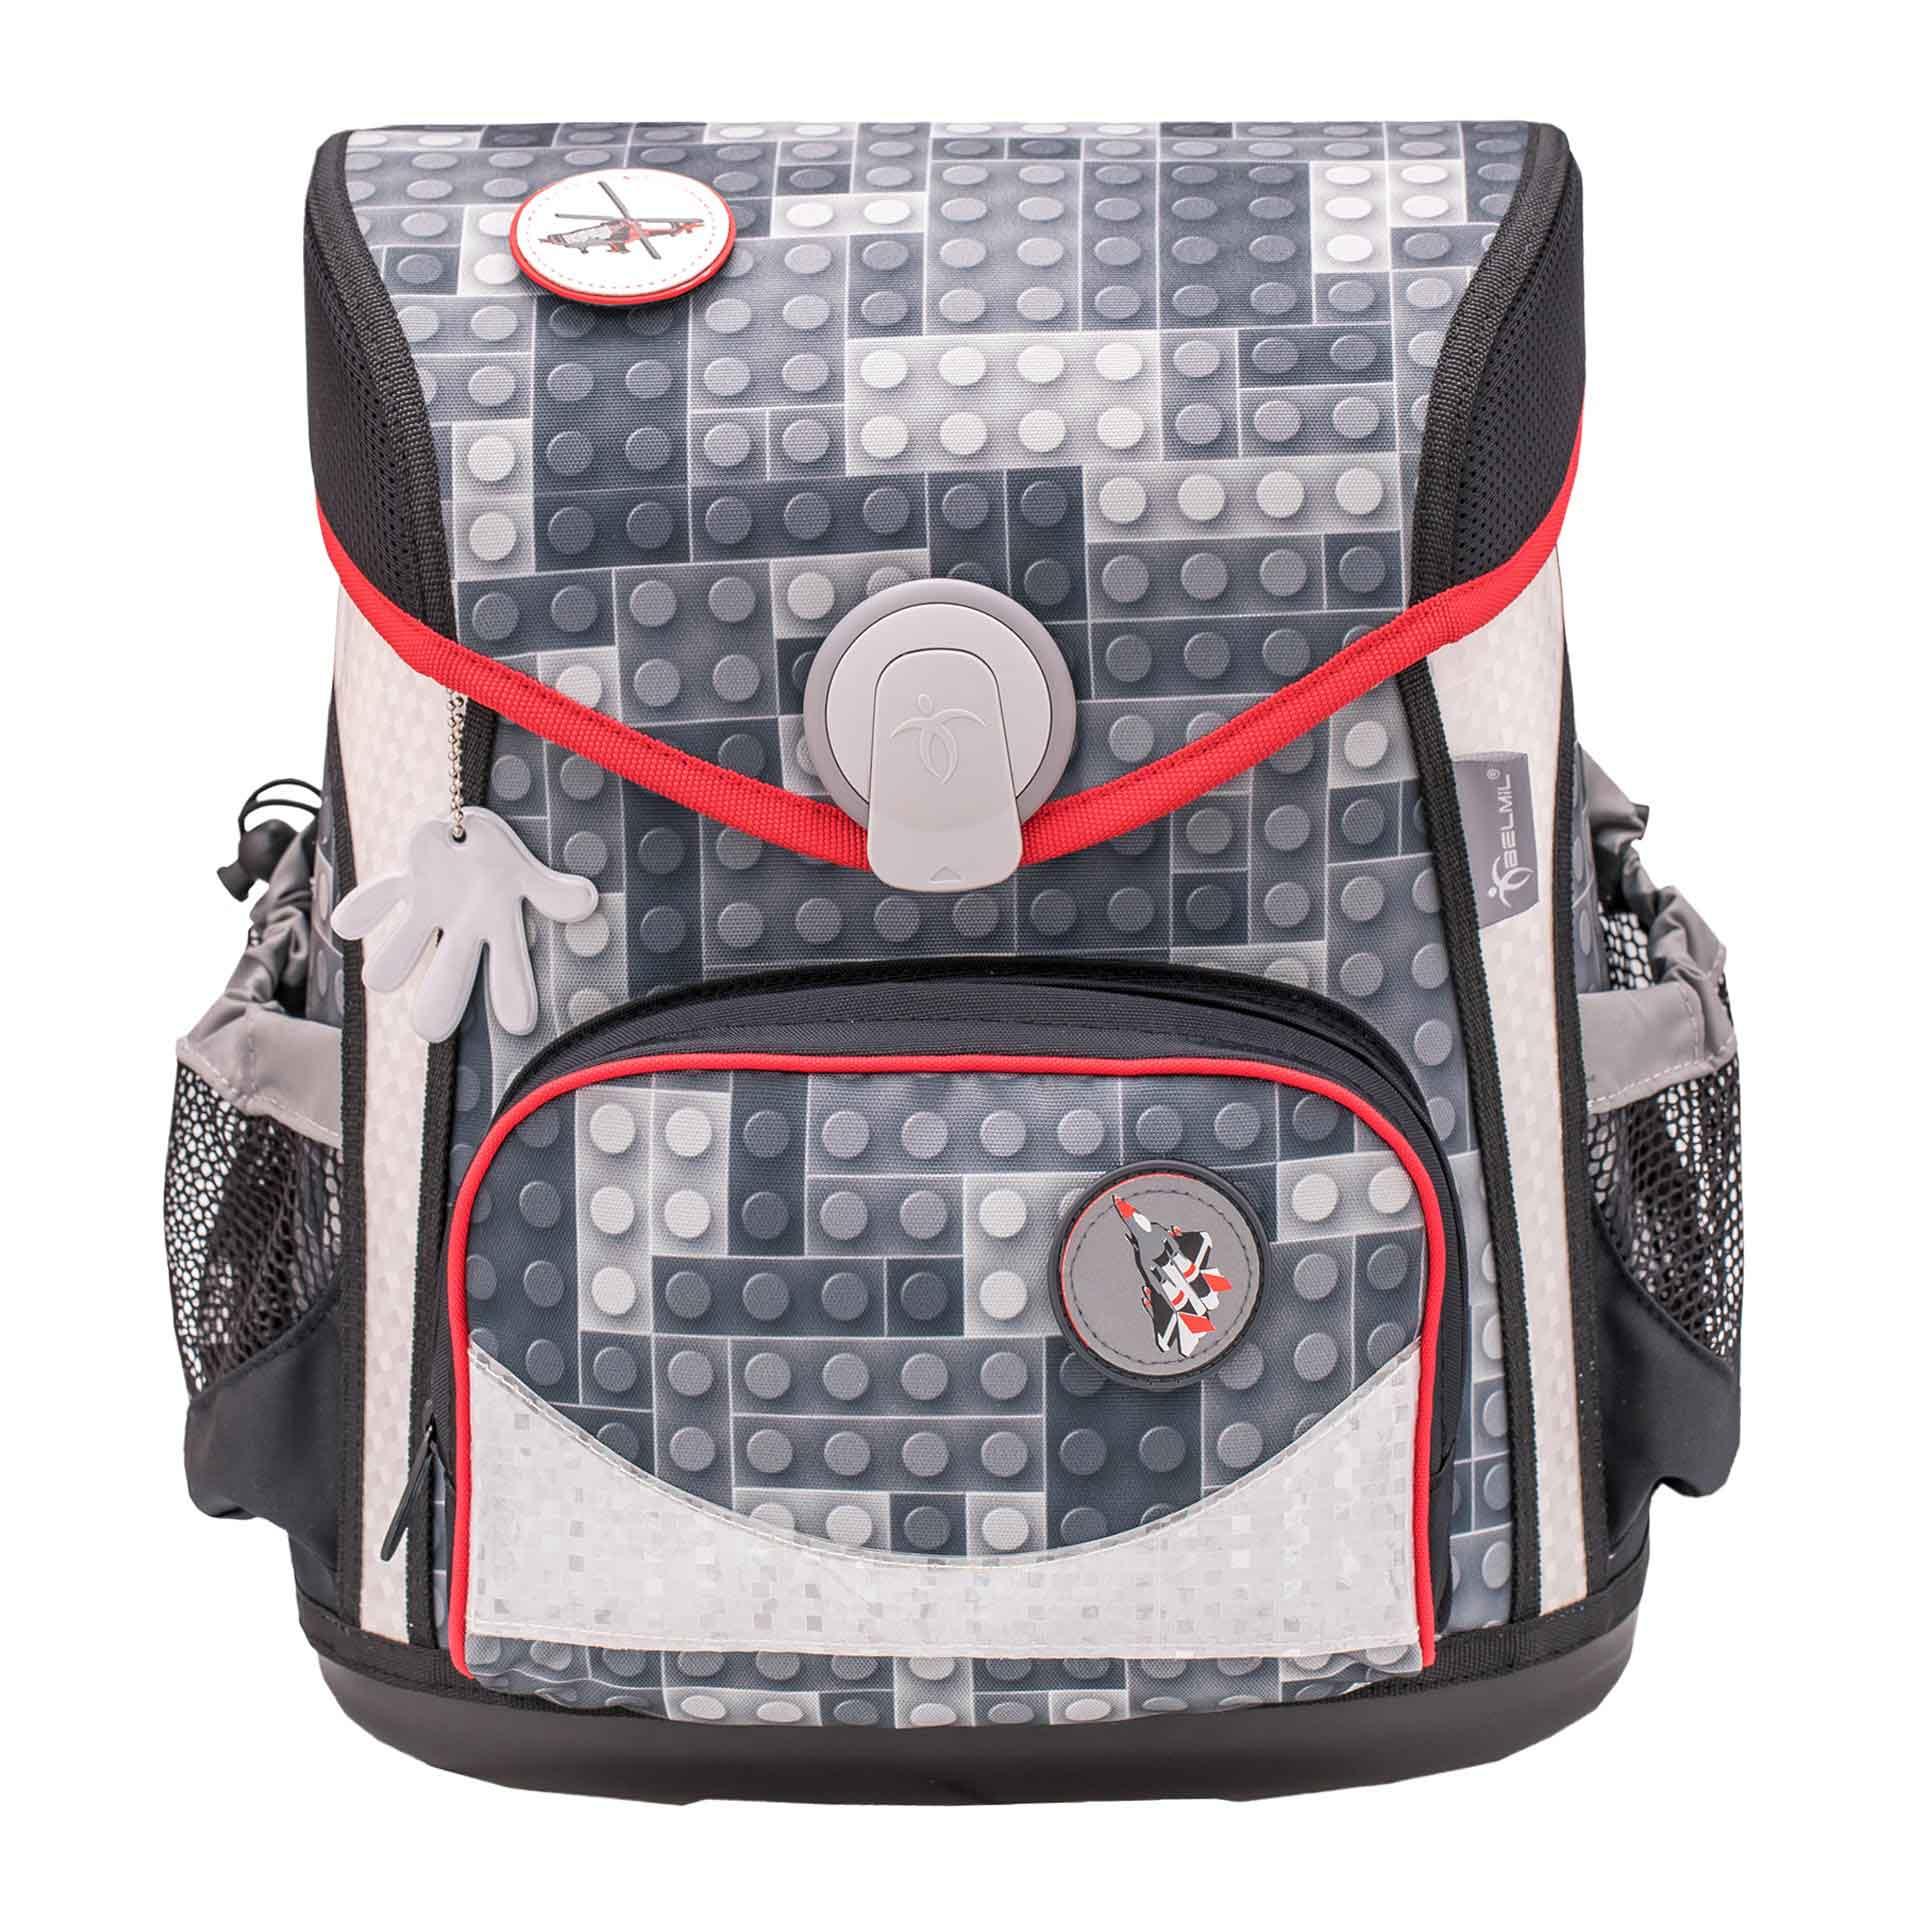 Belmil Cool Bag Schulranzen mit Patch-Set, 4-teilig